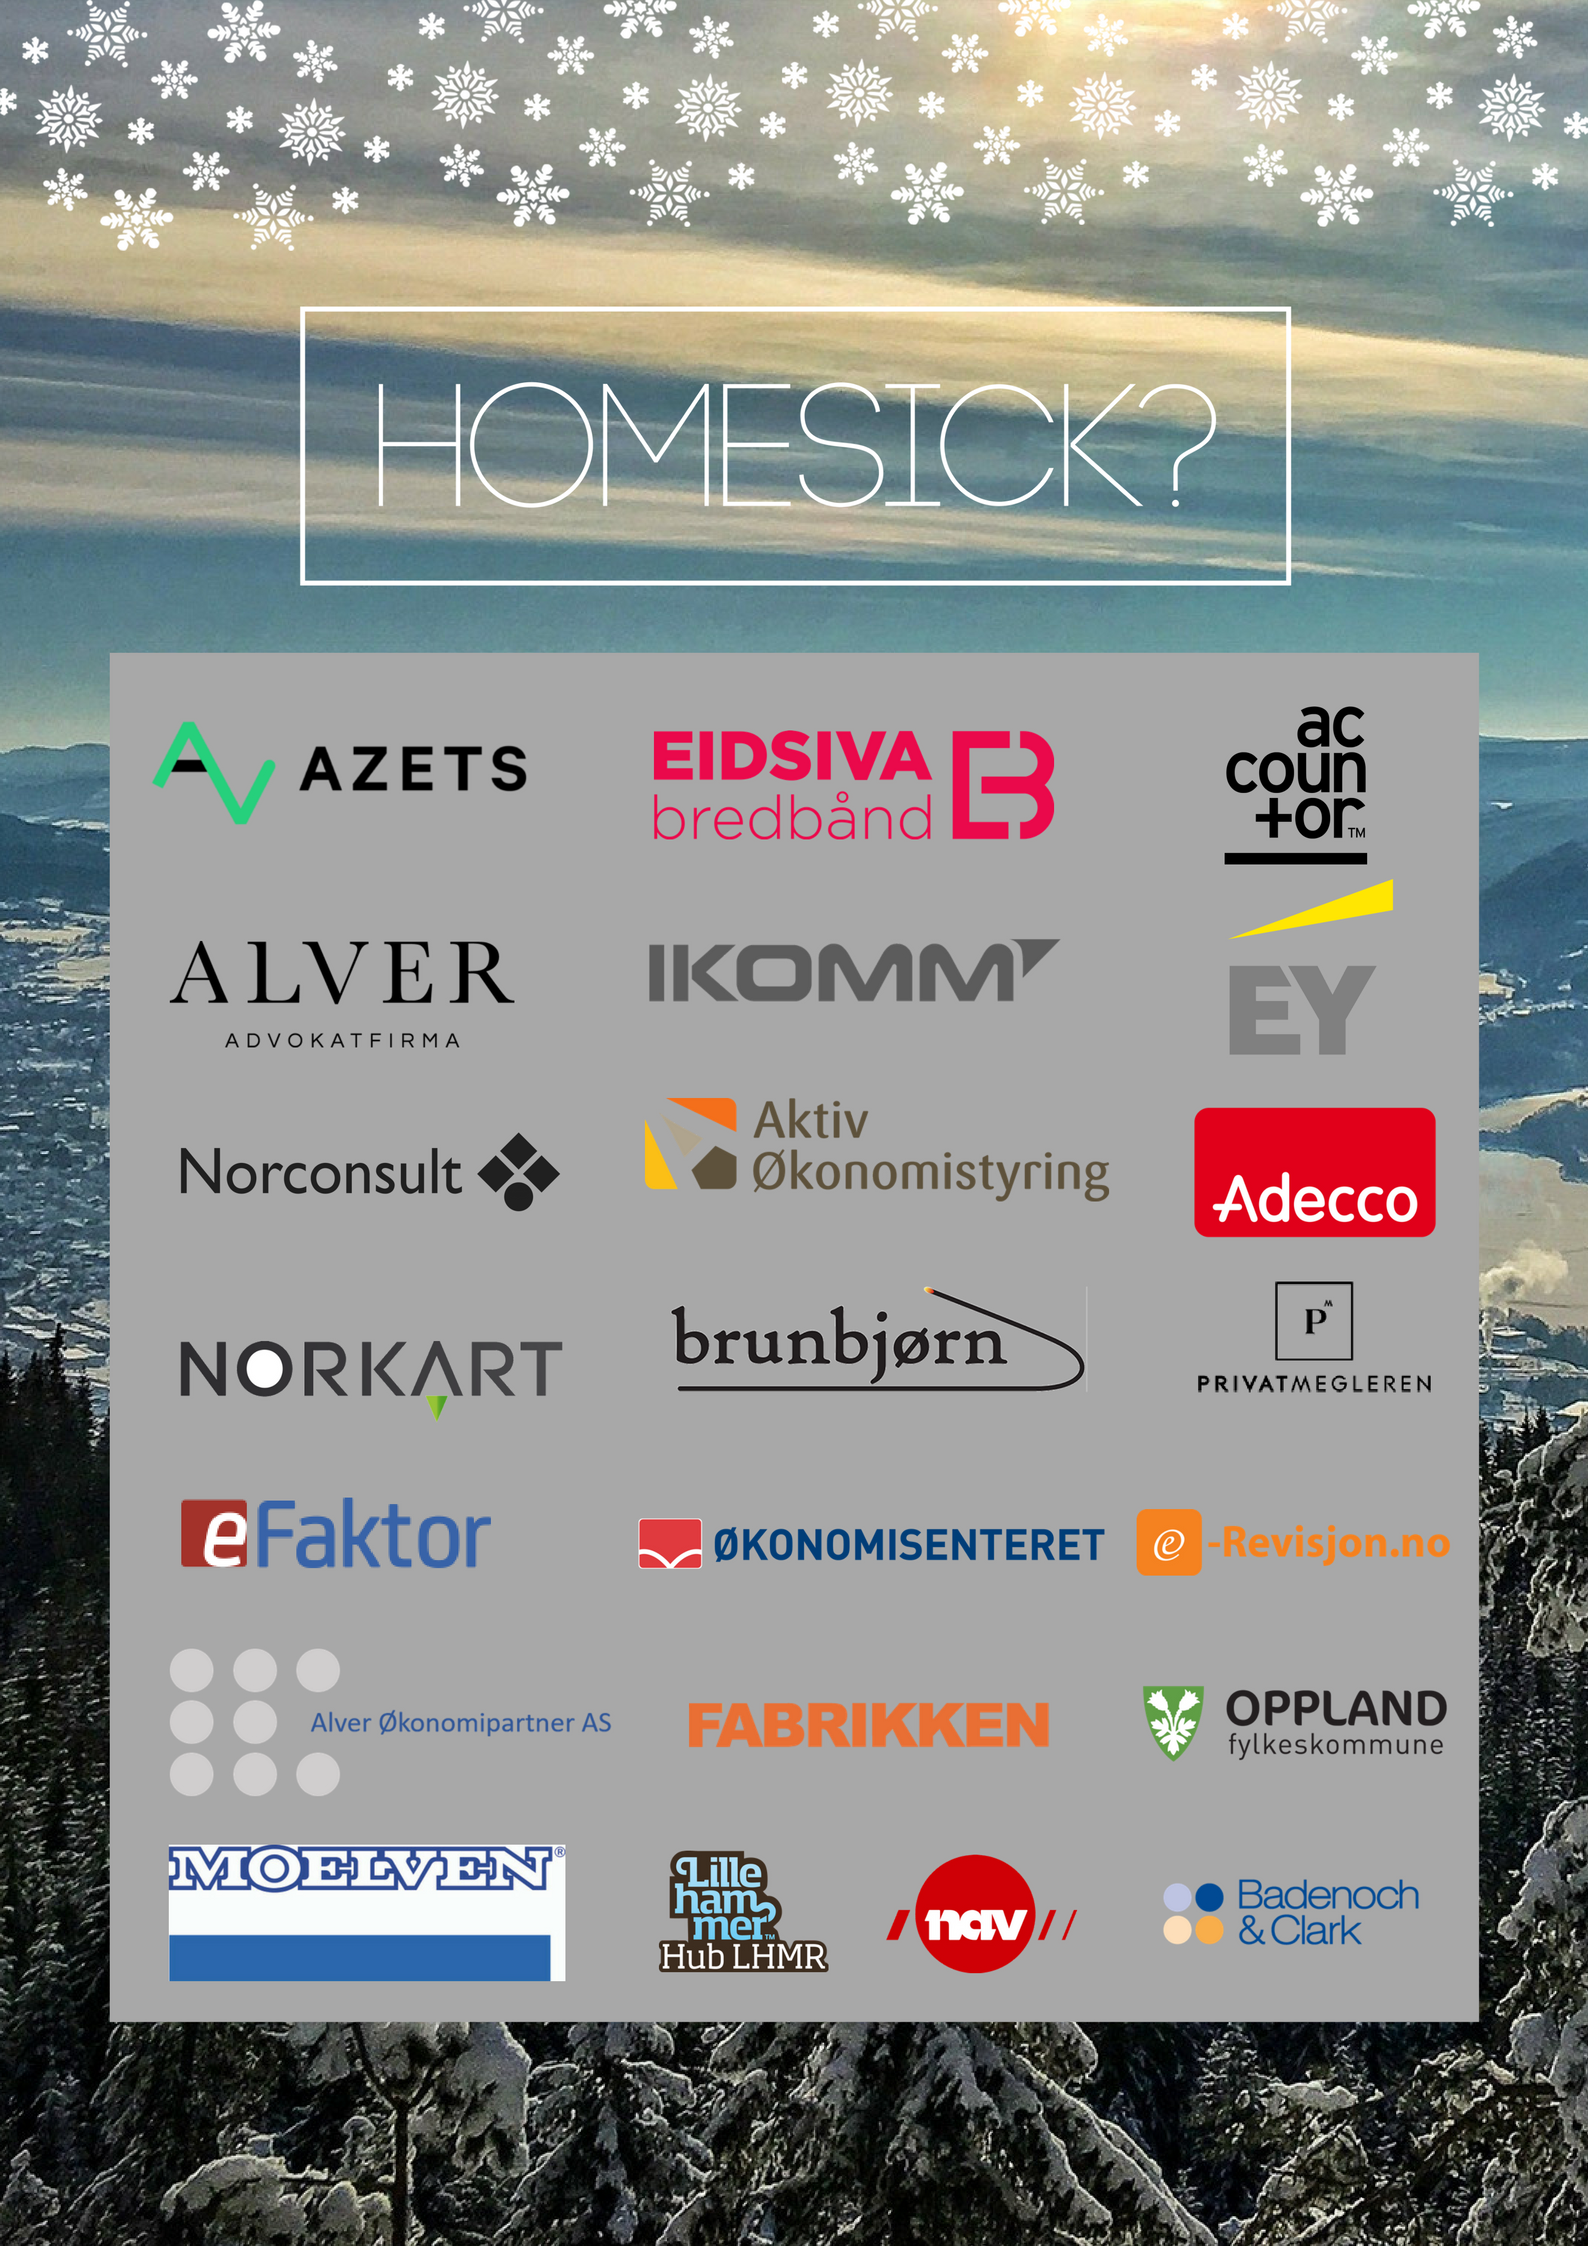 Homesick_Lillehammerregionen_2017.png